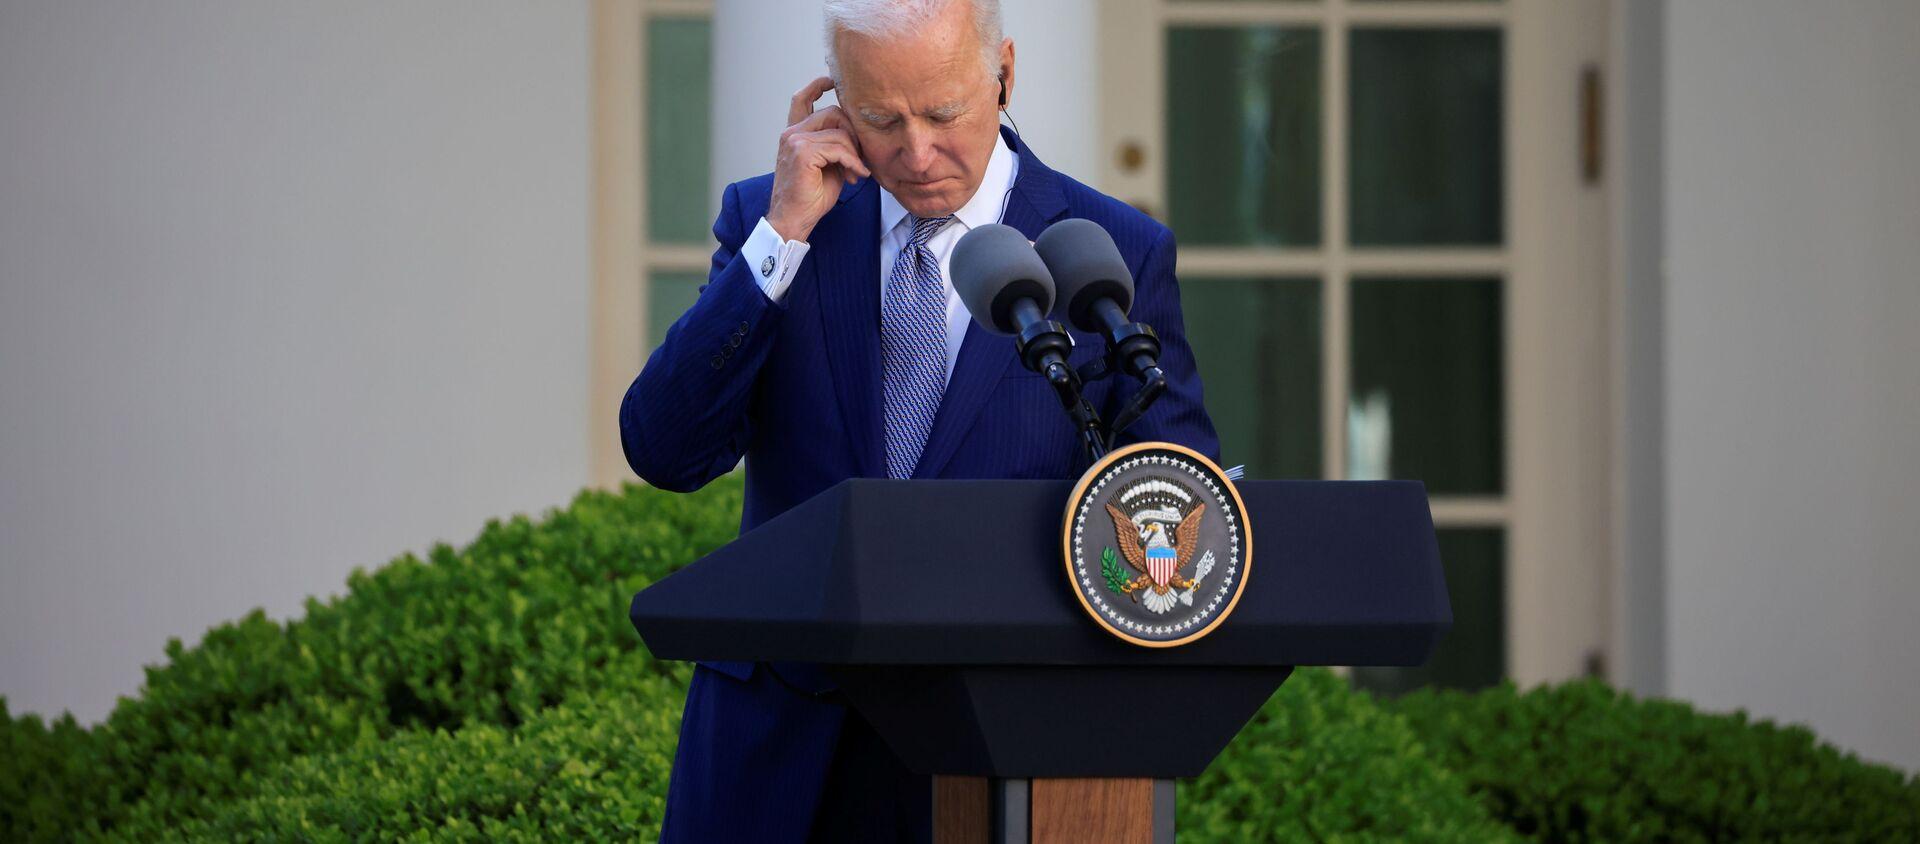 Prezydent USA Joe Biden - Sputnik Polska, 1920, 20.04.2021